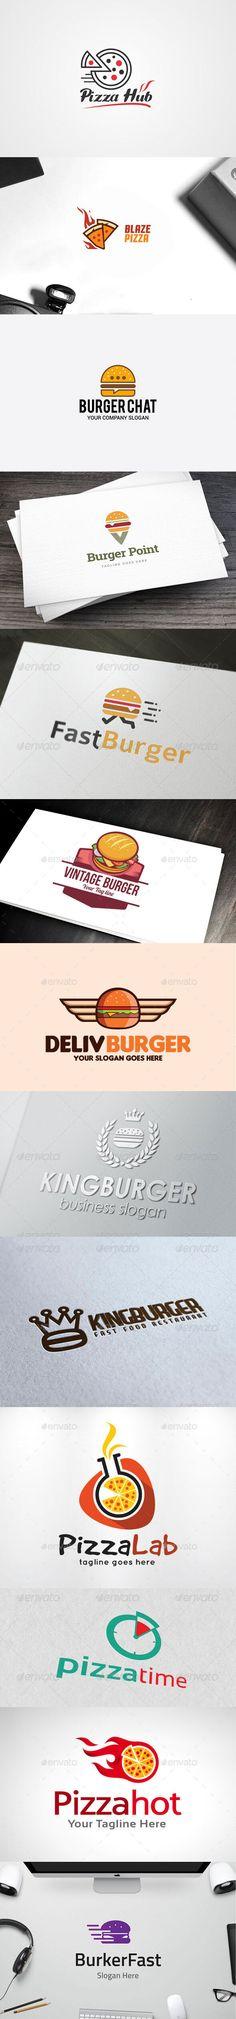 400+ Food Logo Templates ideas